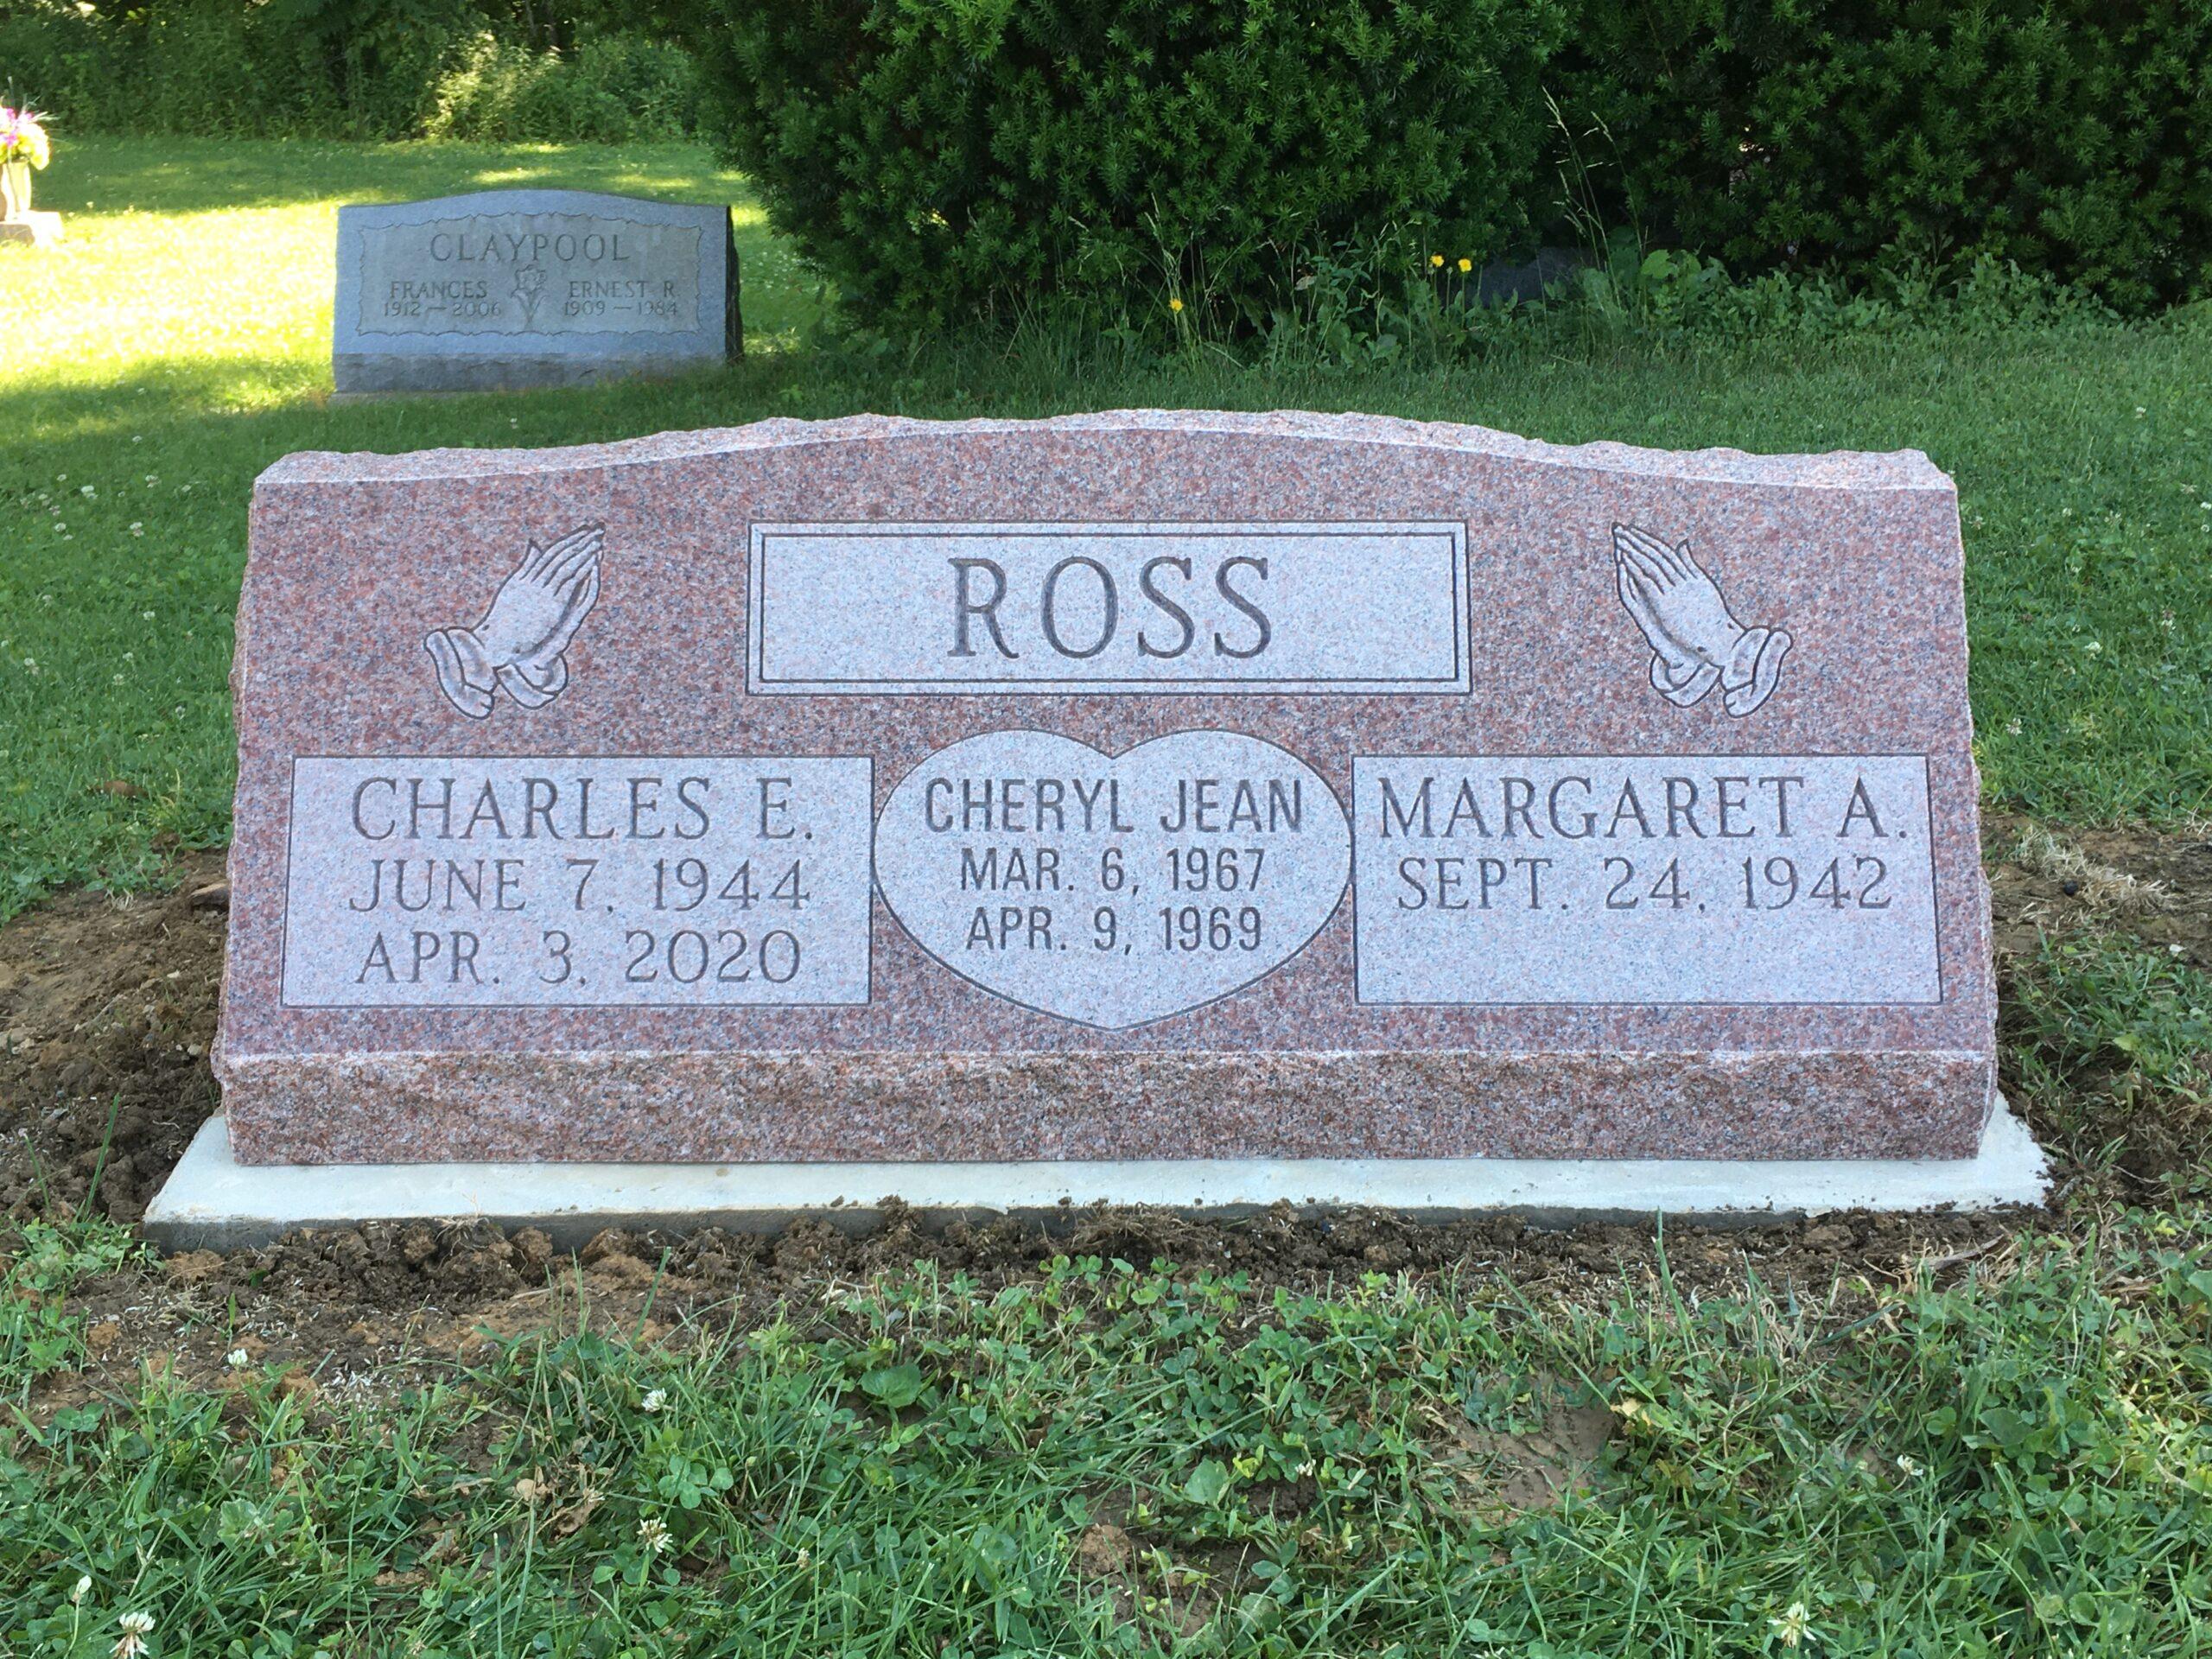 Ross, Charles - Cheryl - Margaret - Williams Cem., 3-6, No. Am. Pink